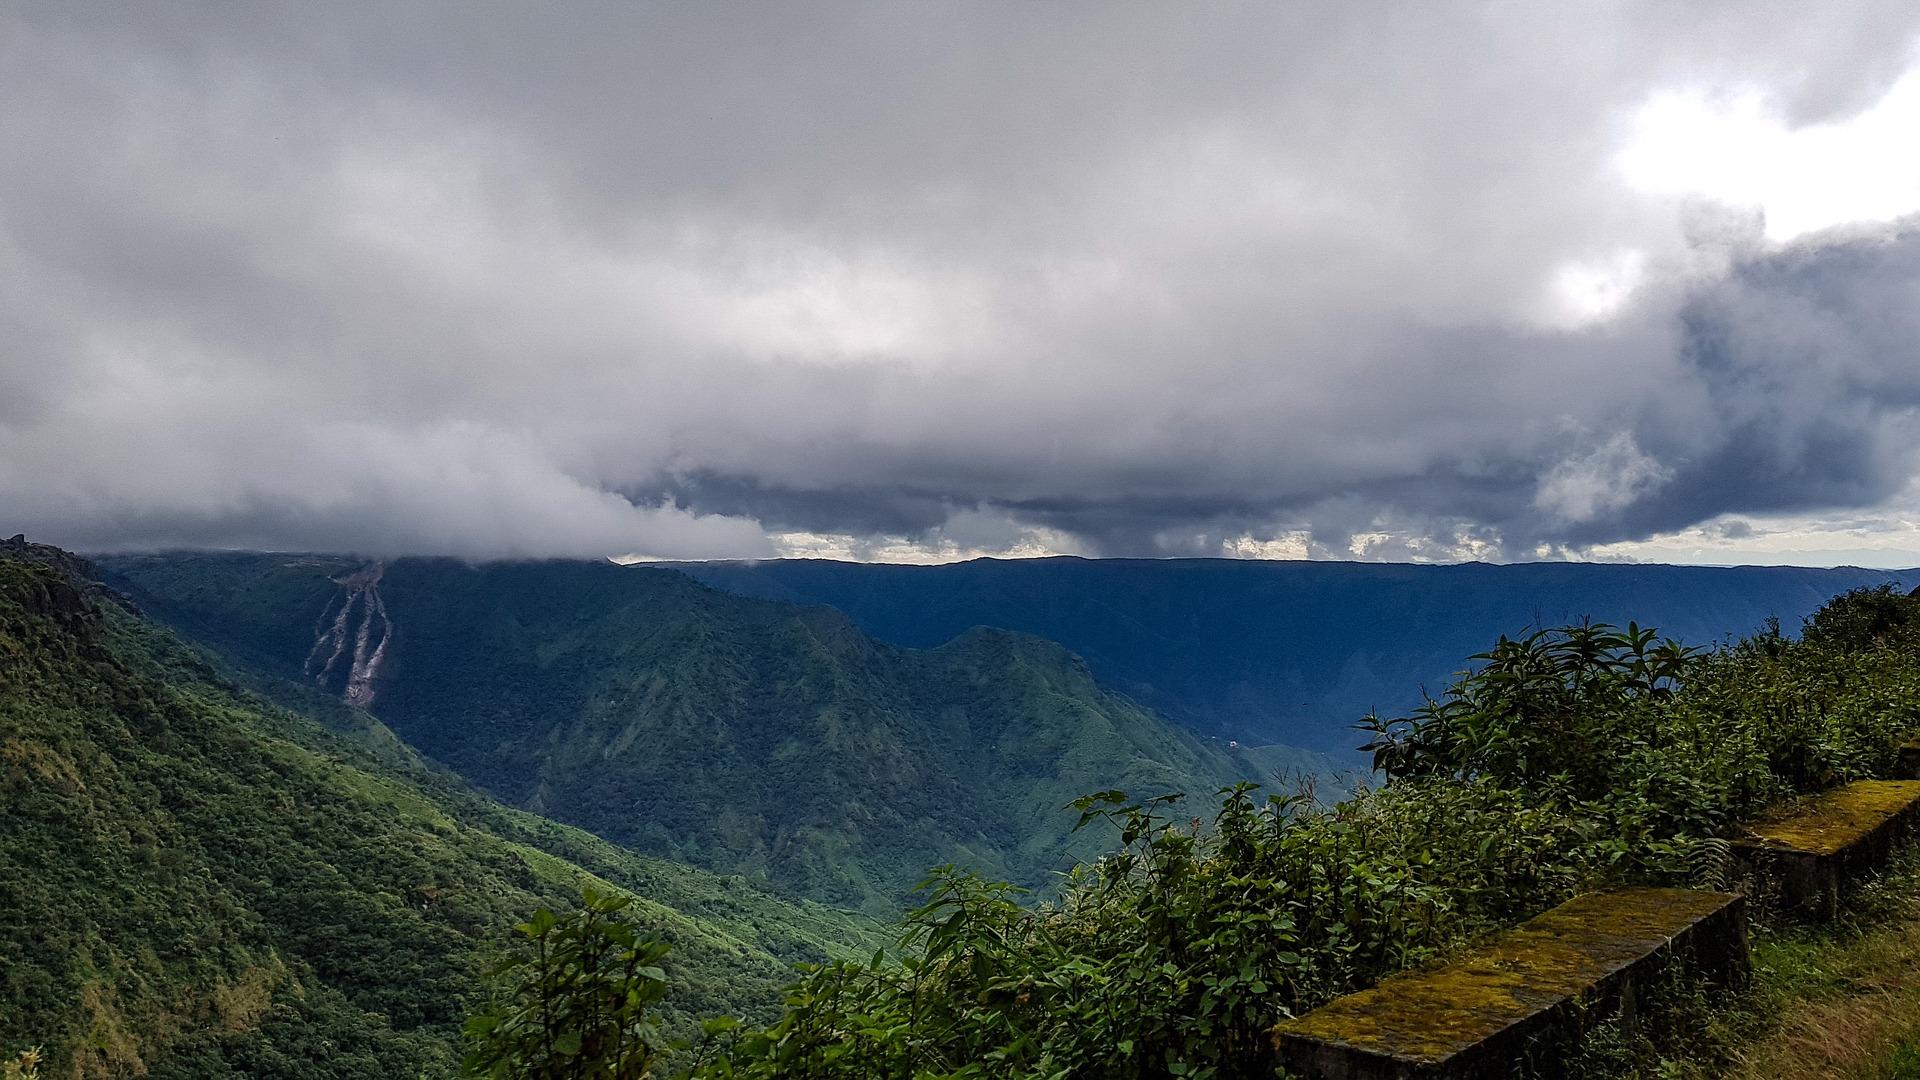 Abode of Clouds - Meghalaya